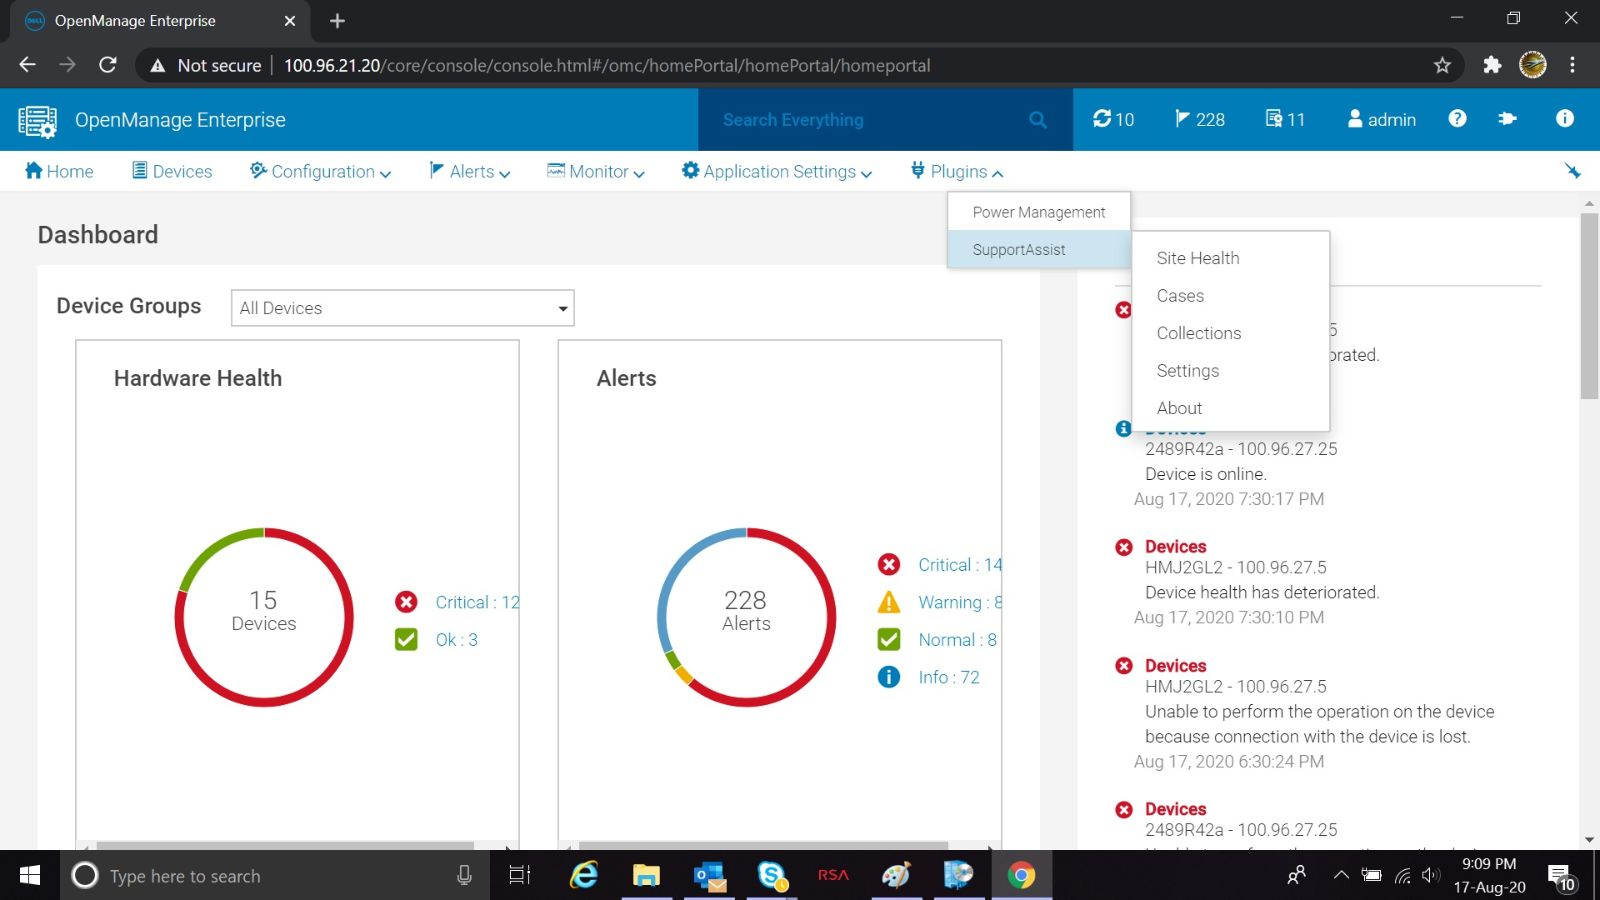 Dell EMC OpenManage Enterprise SupportAssist menu